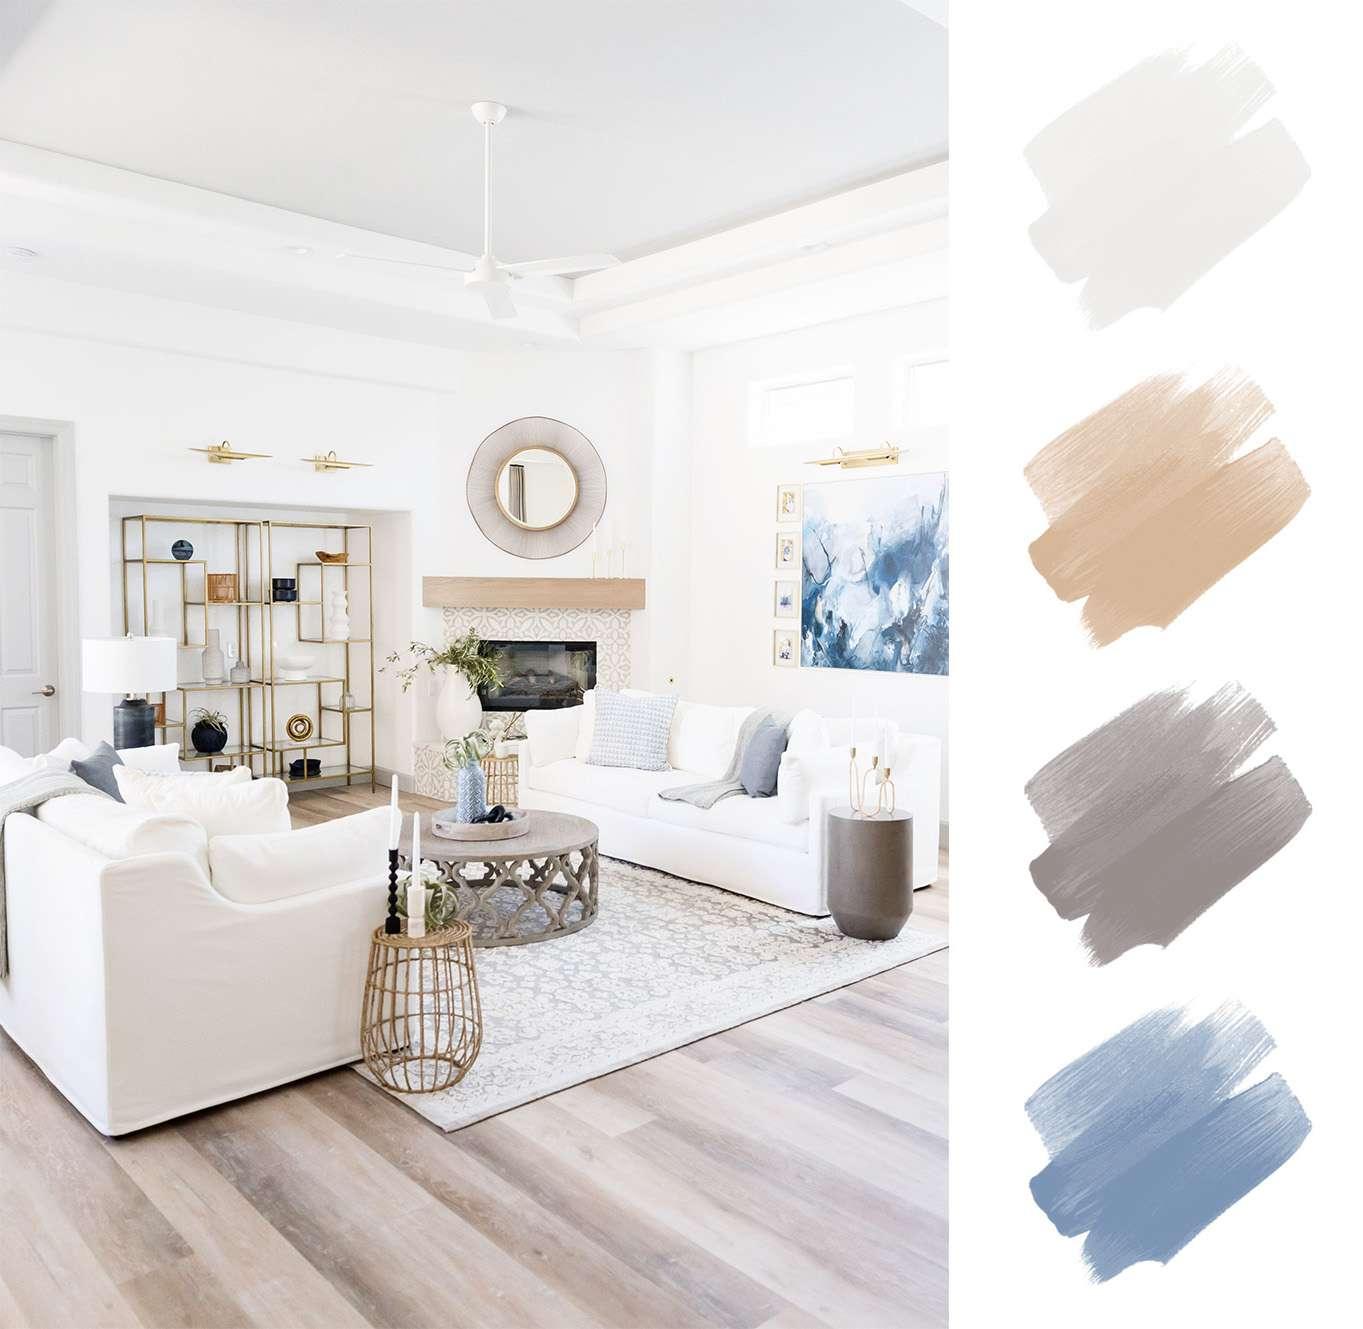 neutral color palette - white, tan, grayish brown, blue